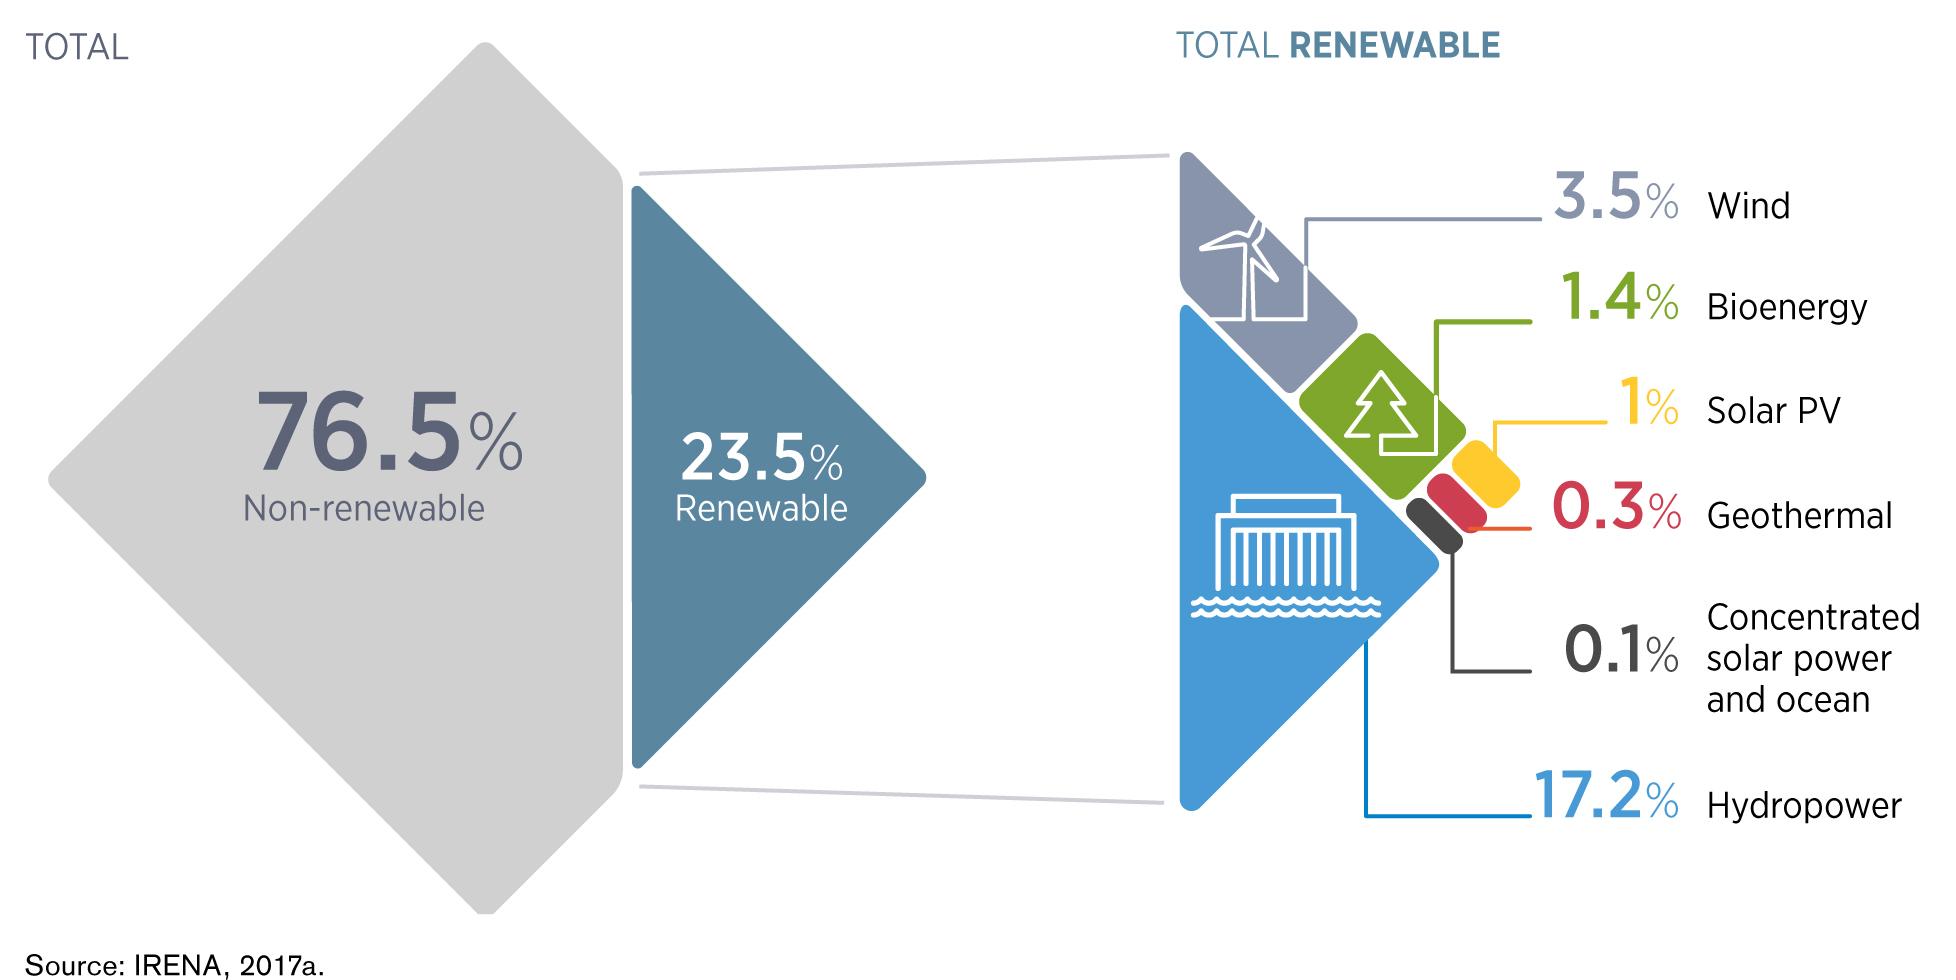 Рис. 1. Глобальне виробництво електроенергії за типами генерації. Джерело: IRENA «Renewable Energy Policies in a Time of Transition», 2018.